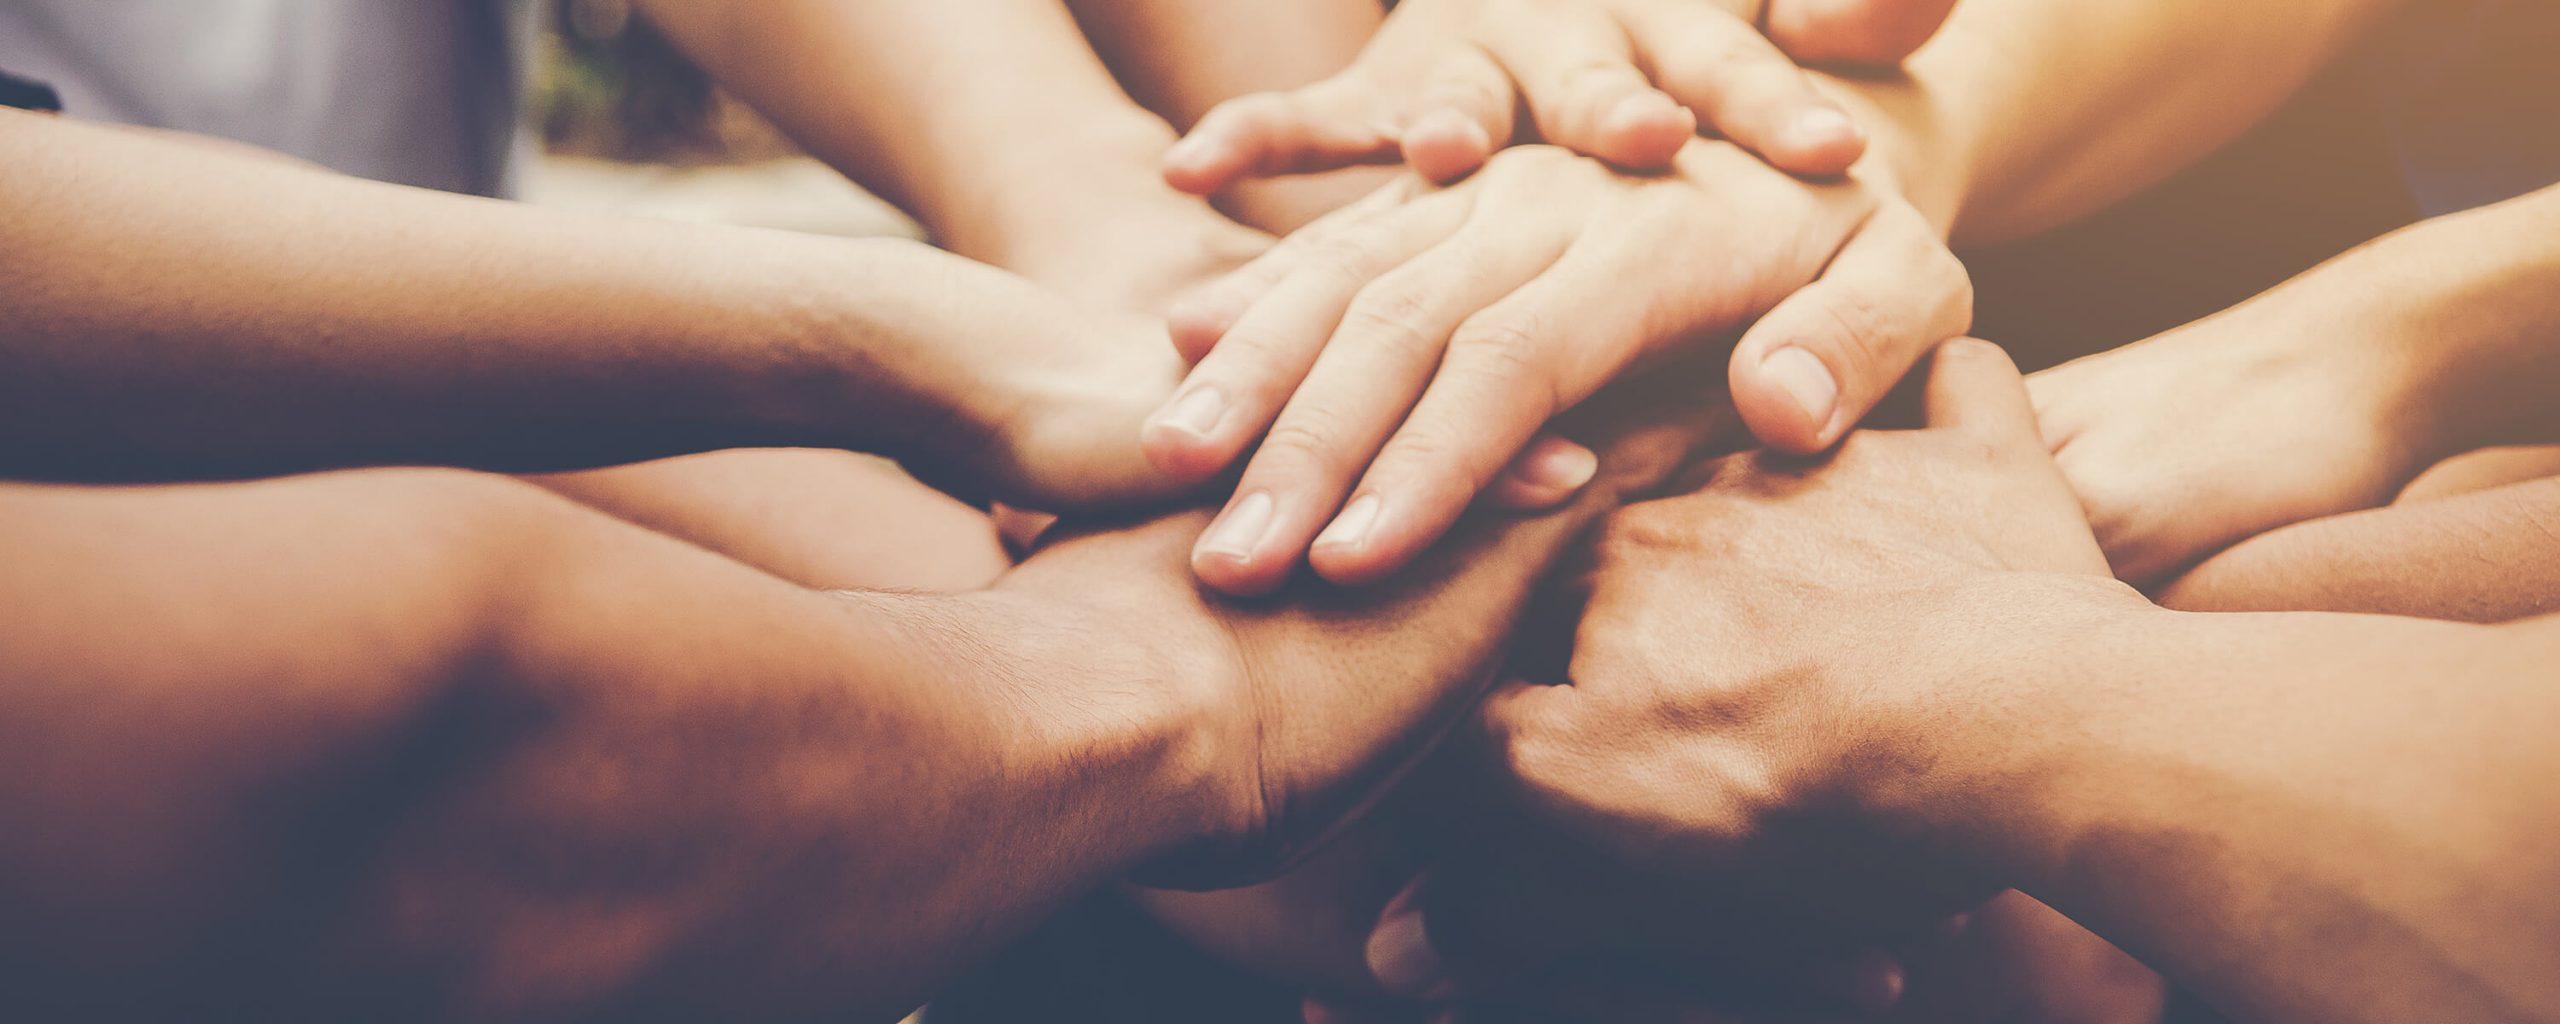 Servicios Socio-económicos de Grupo Innovaris